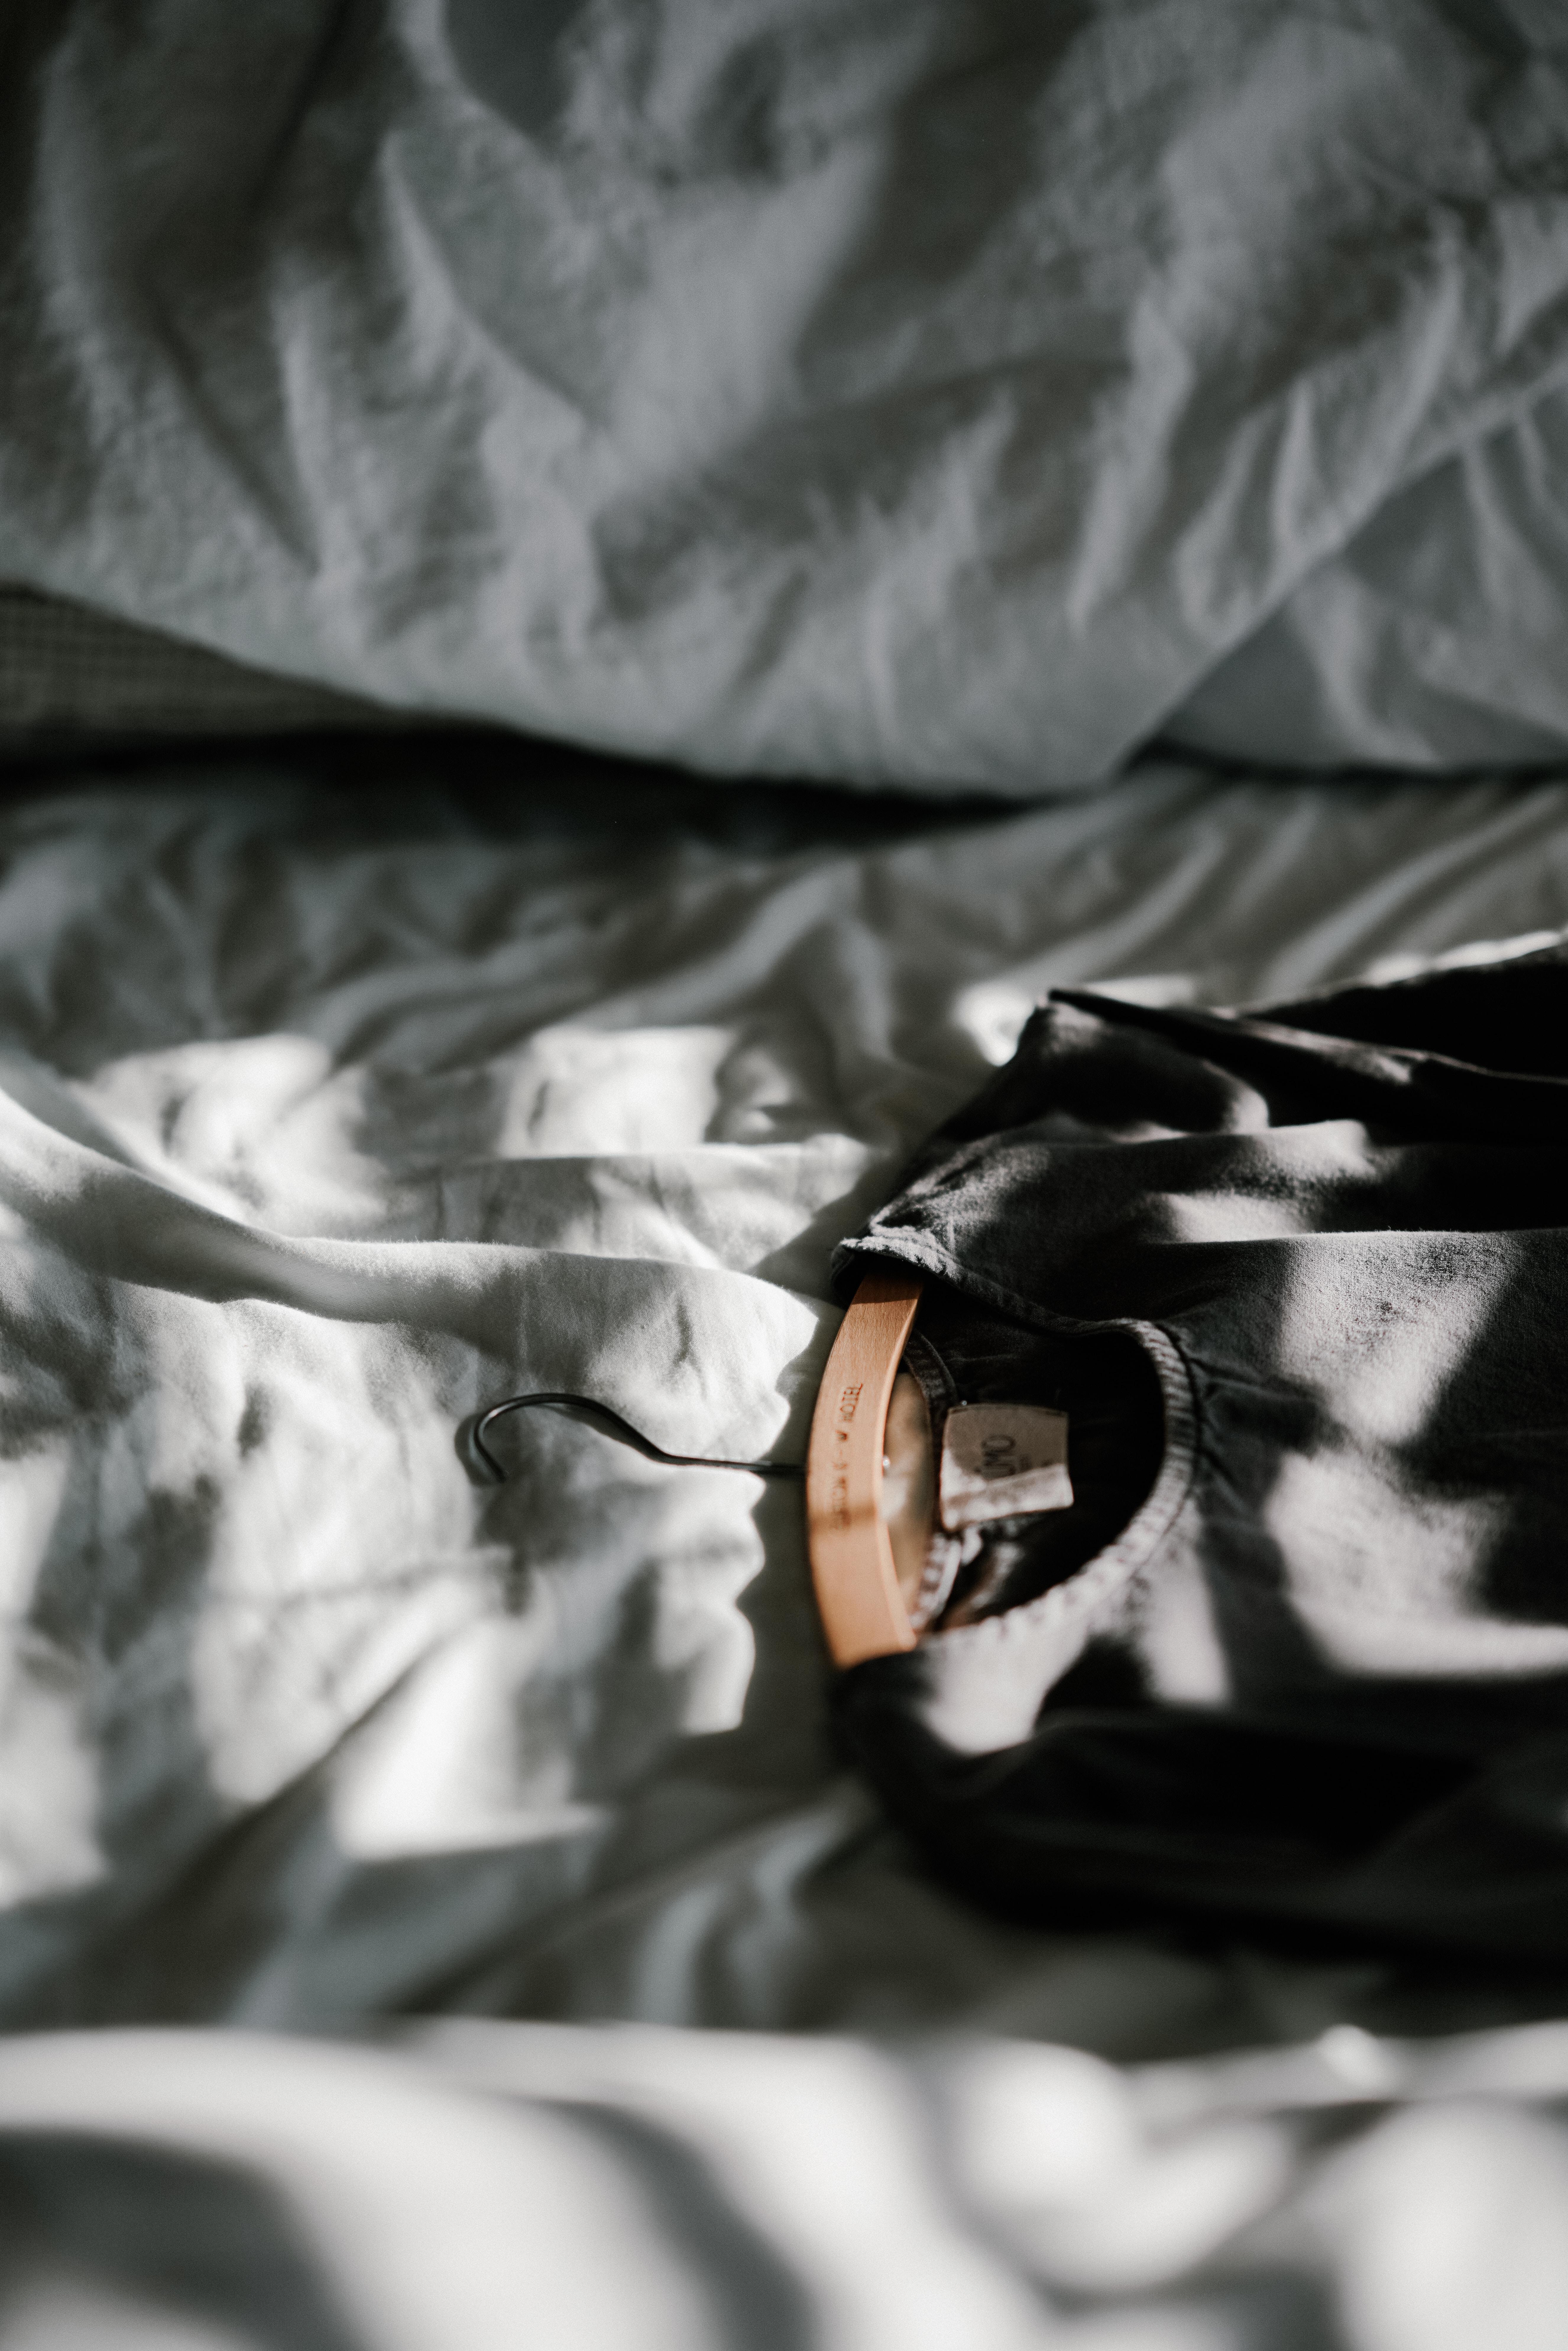 black scoop-neck top on white textile